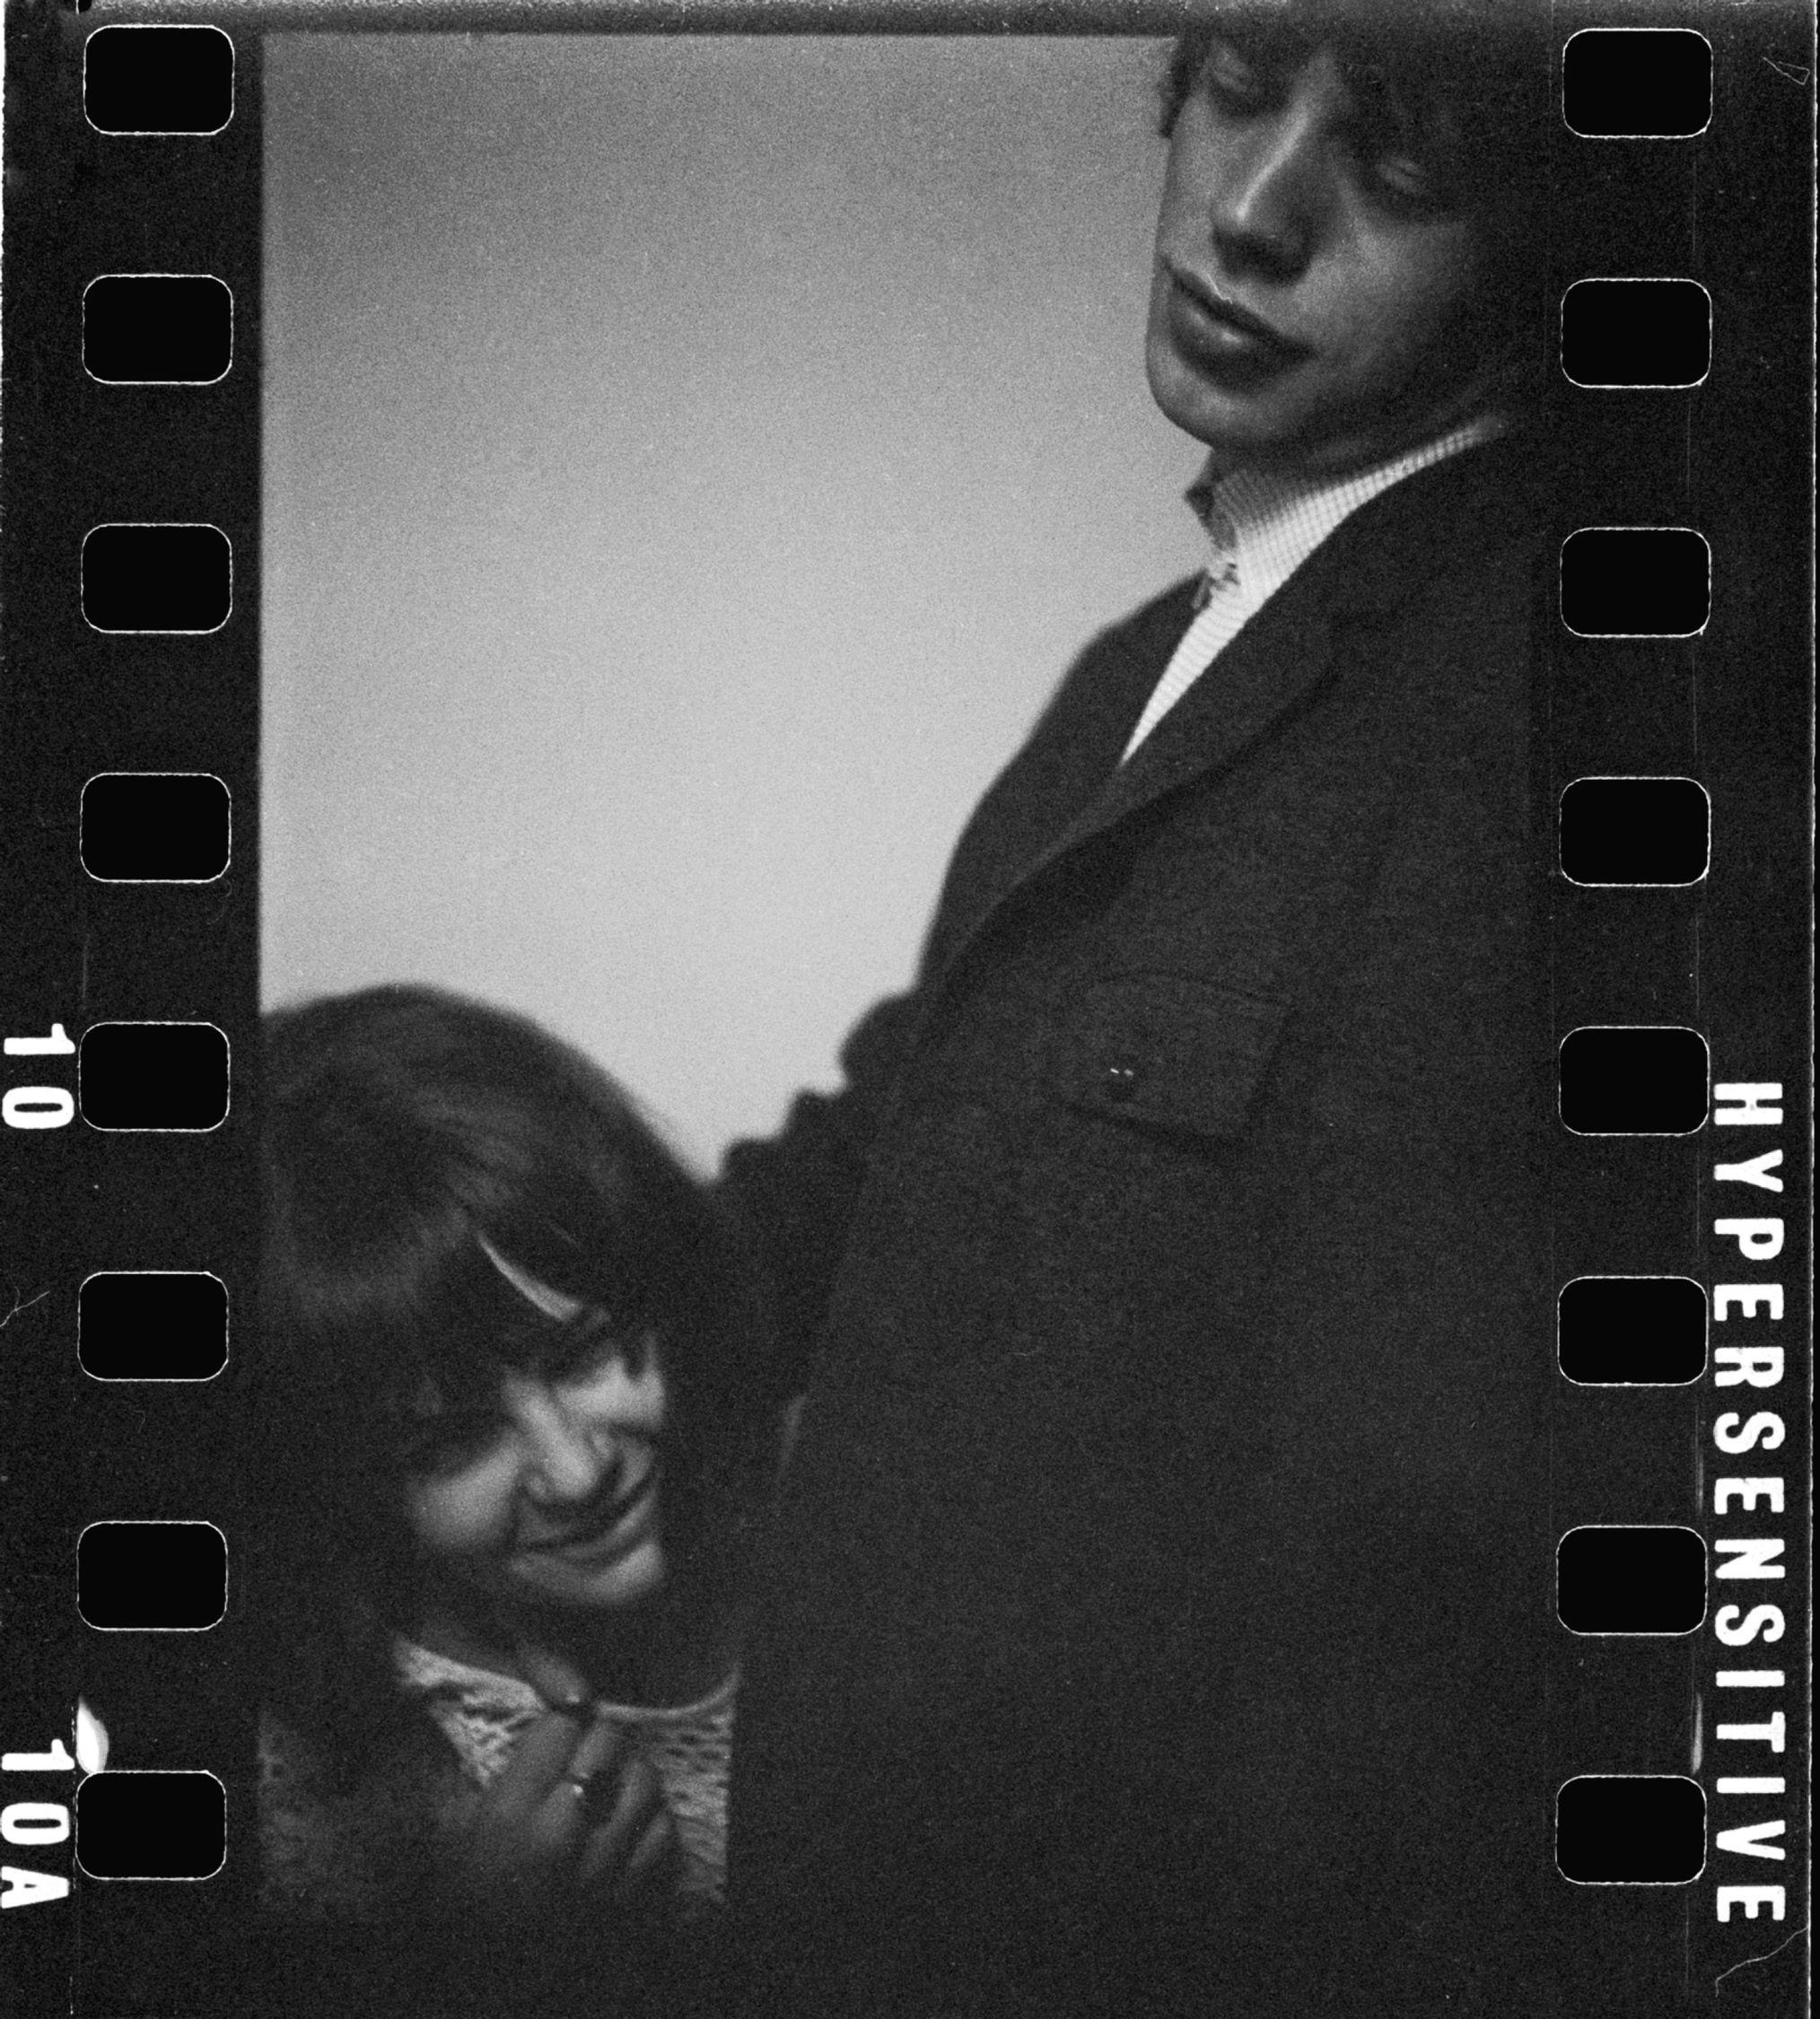 Mick Jagger & Chrissie Shrimpton, 1963